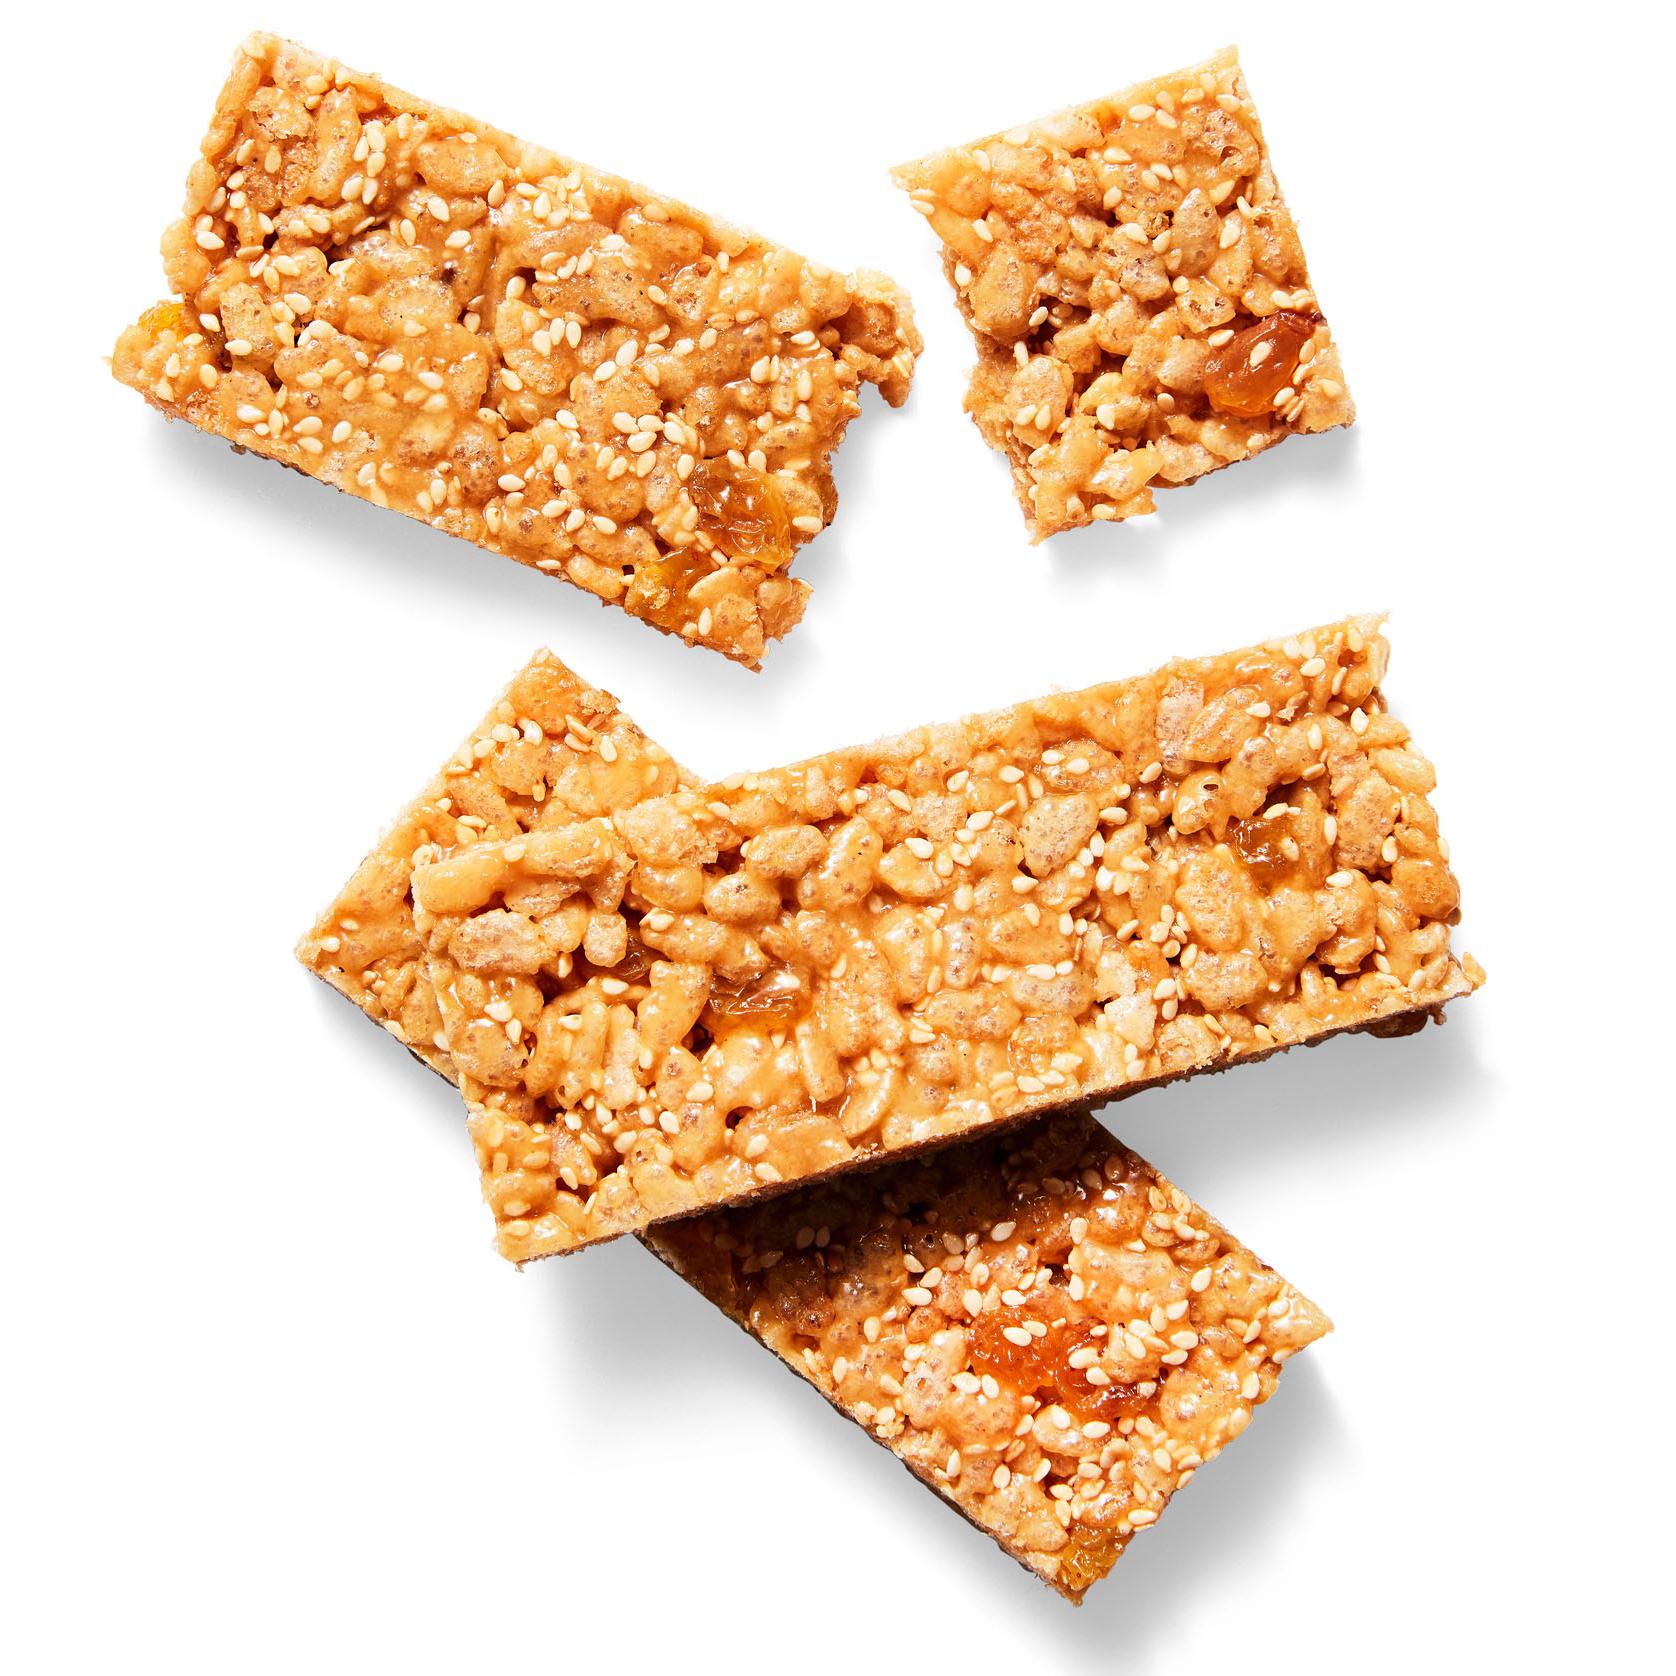 sesame-raisin cereal bars